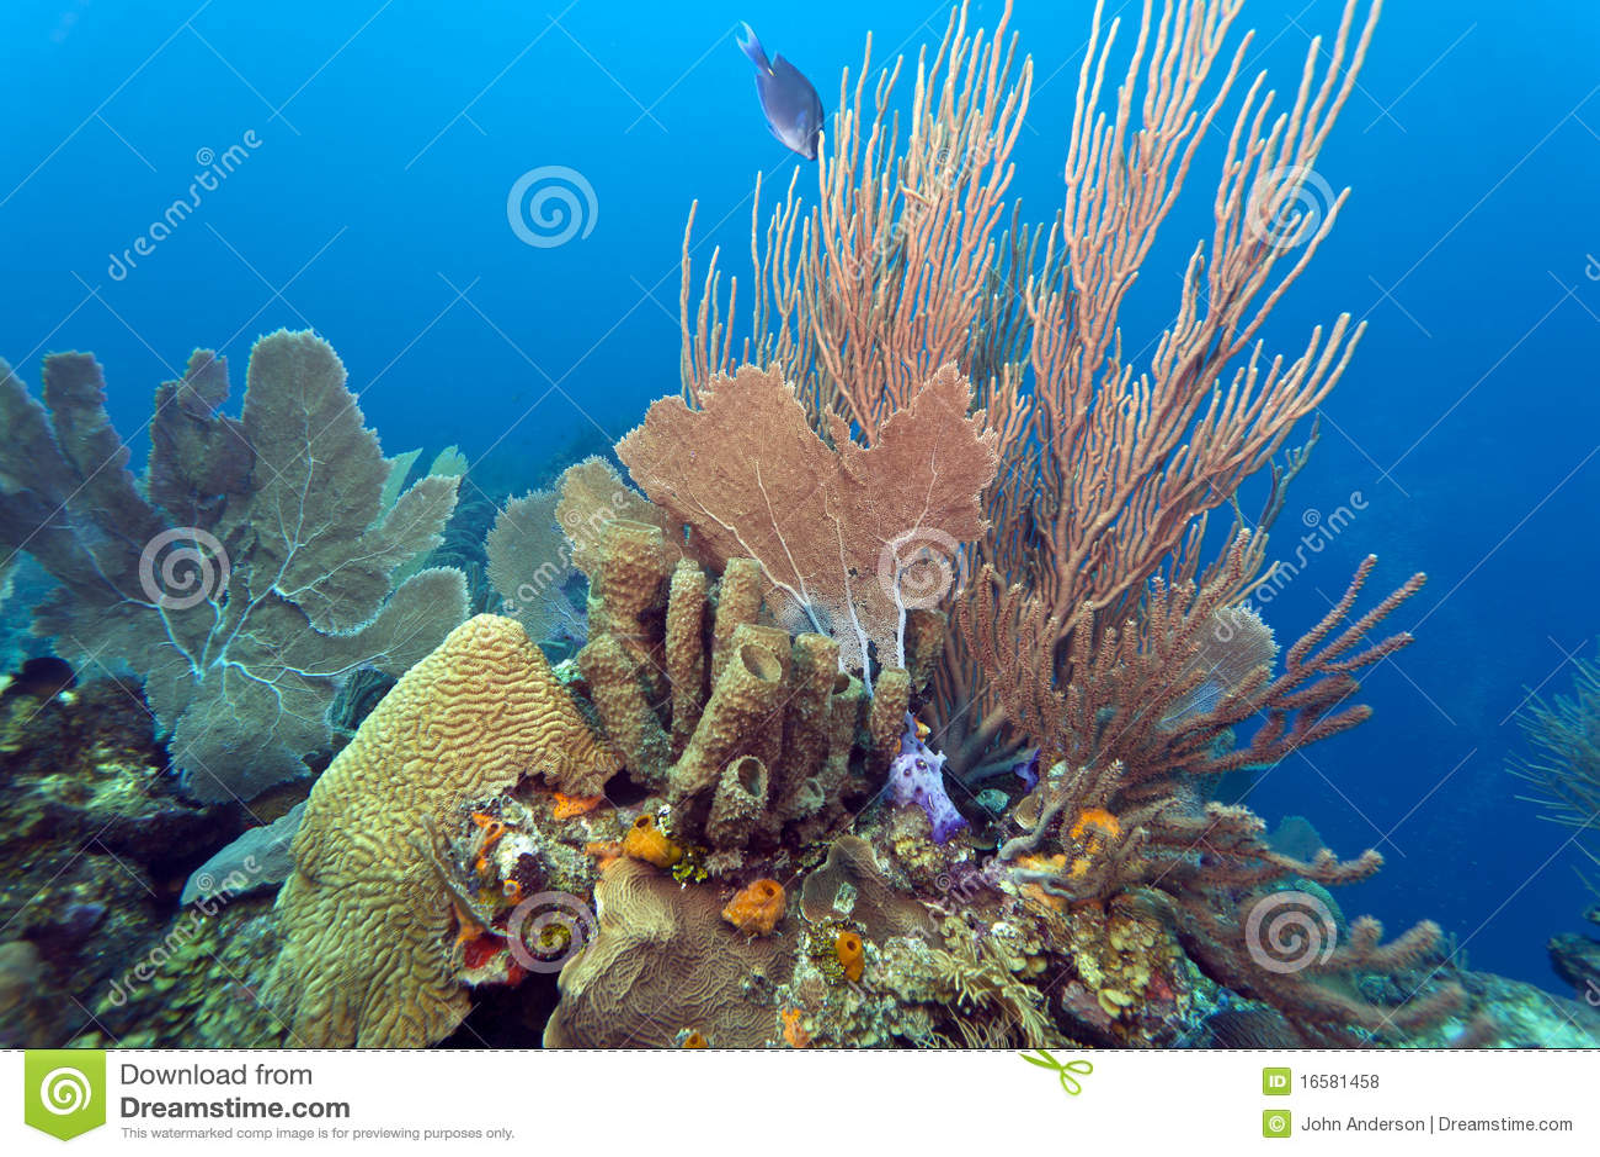 Coral Gardens Royalty Free Stock Photos Image 16581458